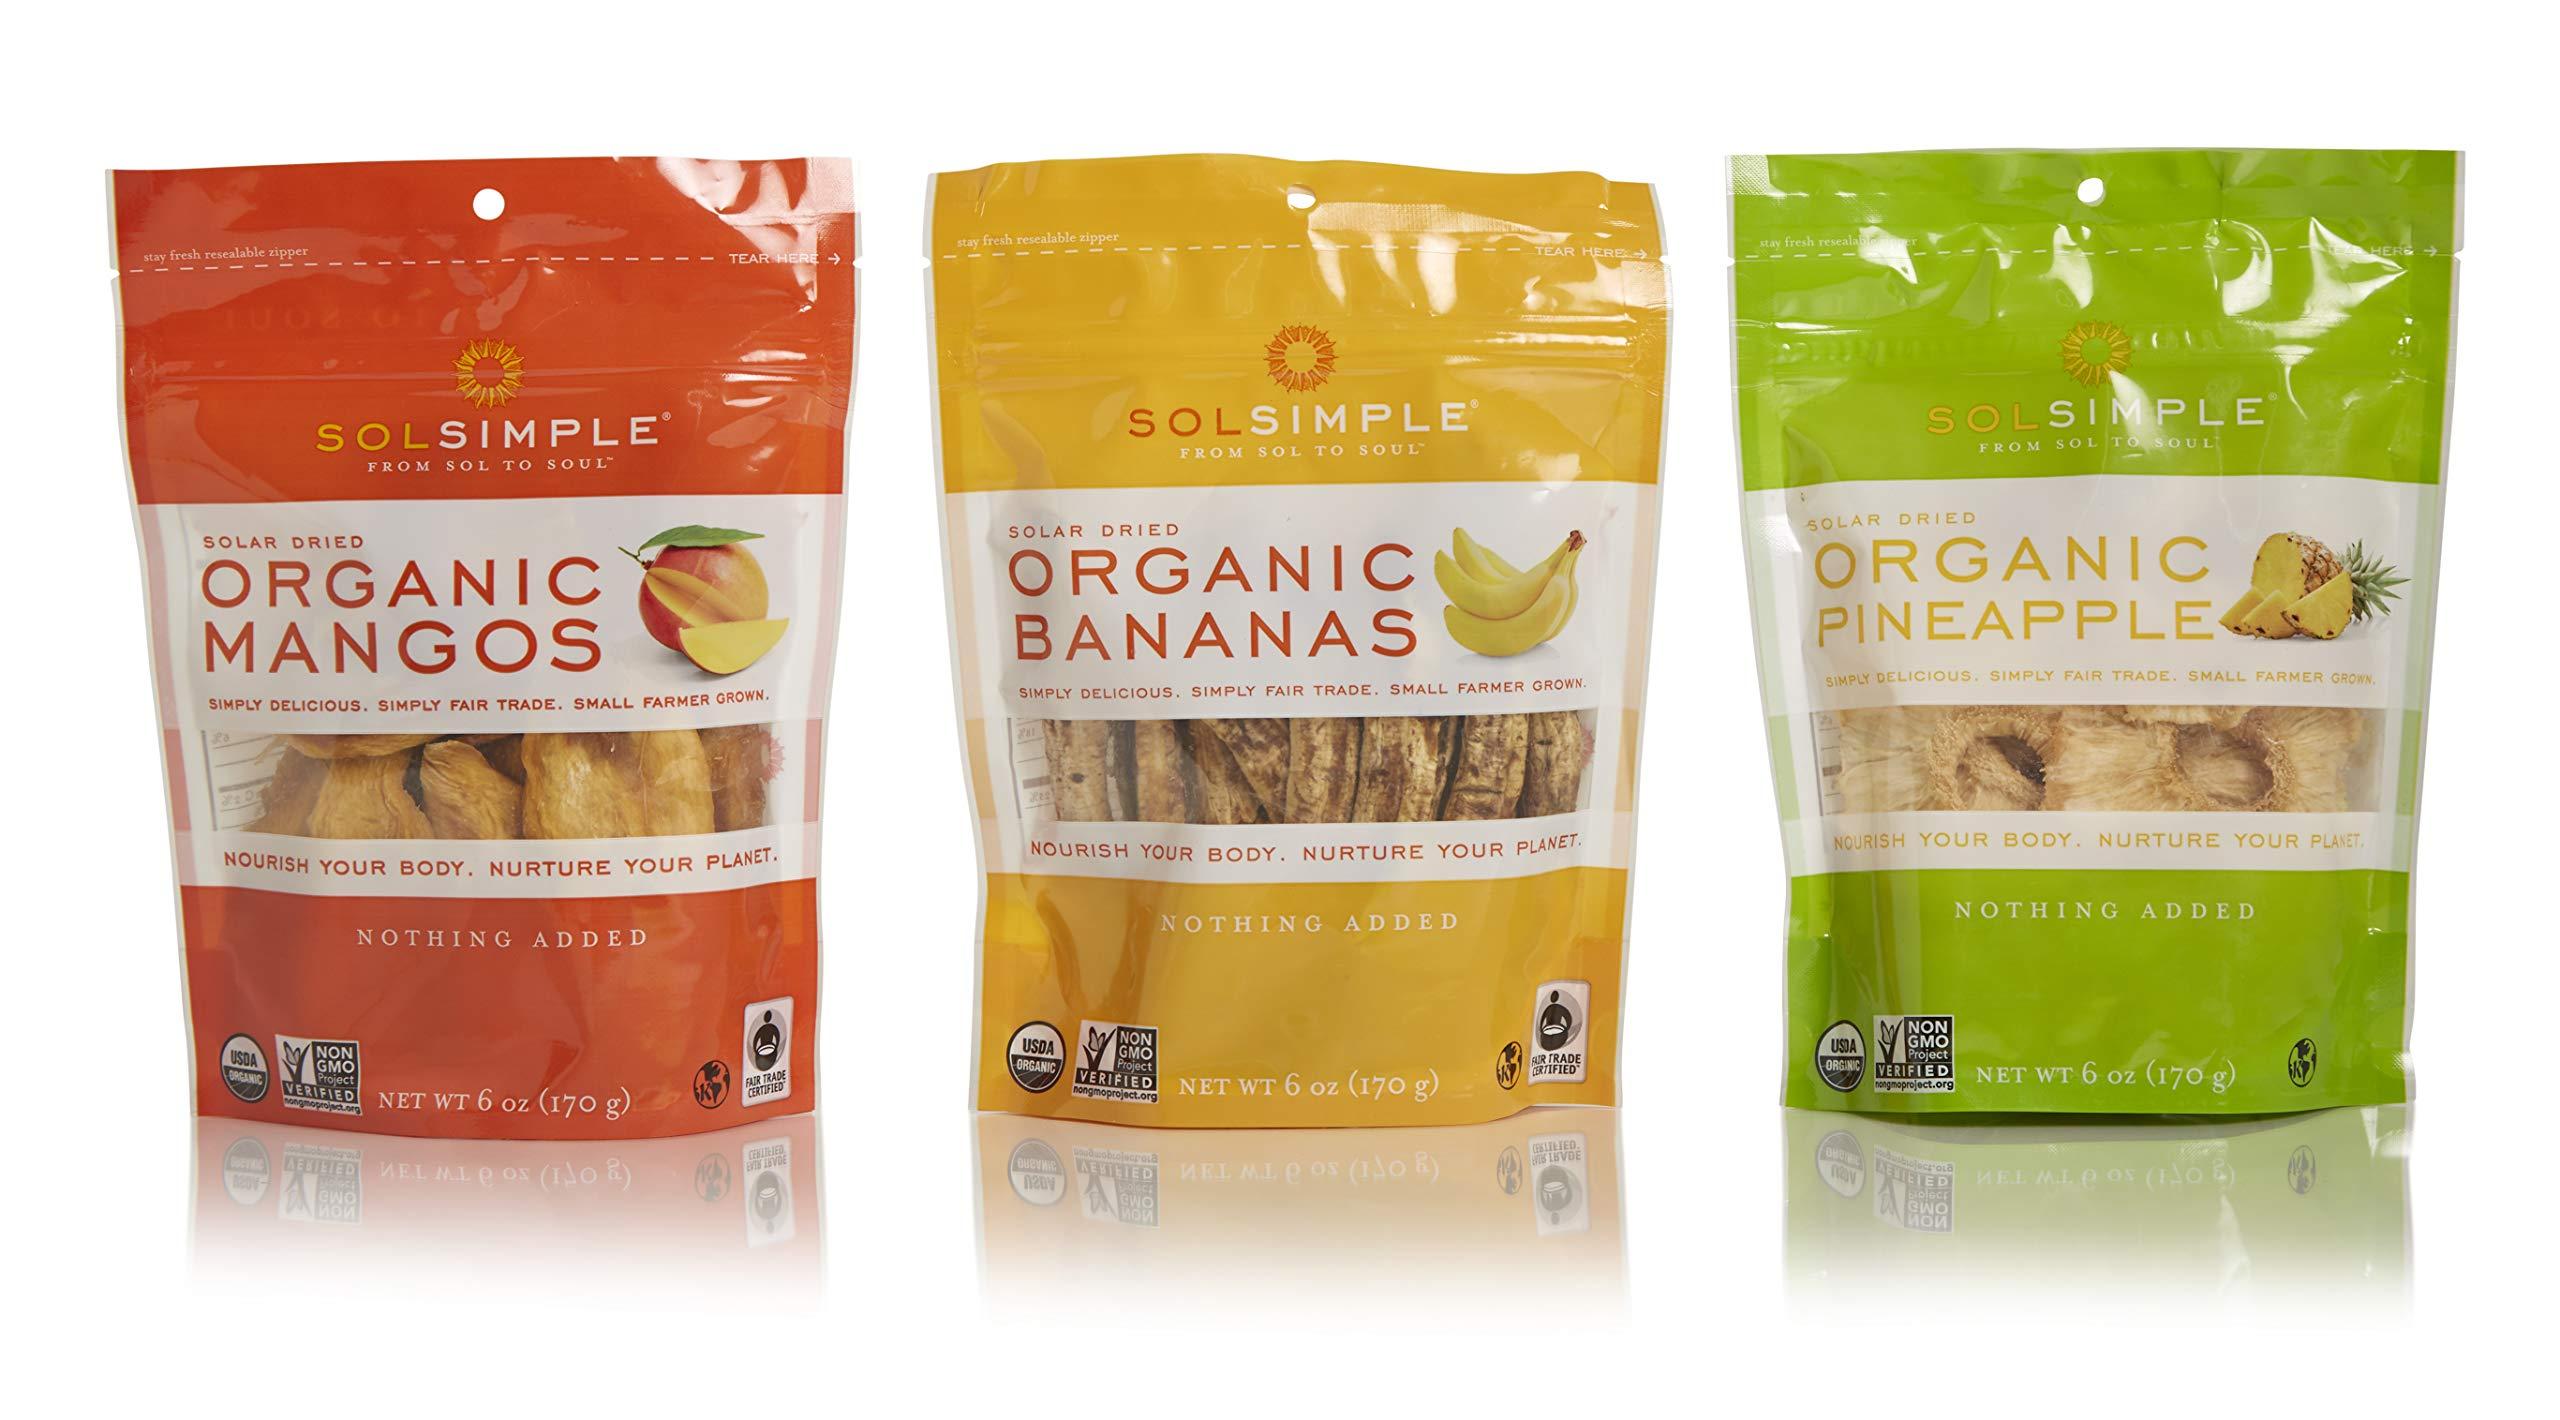 Sol Simple Organic Variety Pack - Mangos, Bananas, Pineapple 6oz, Pack of 3